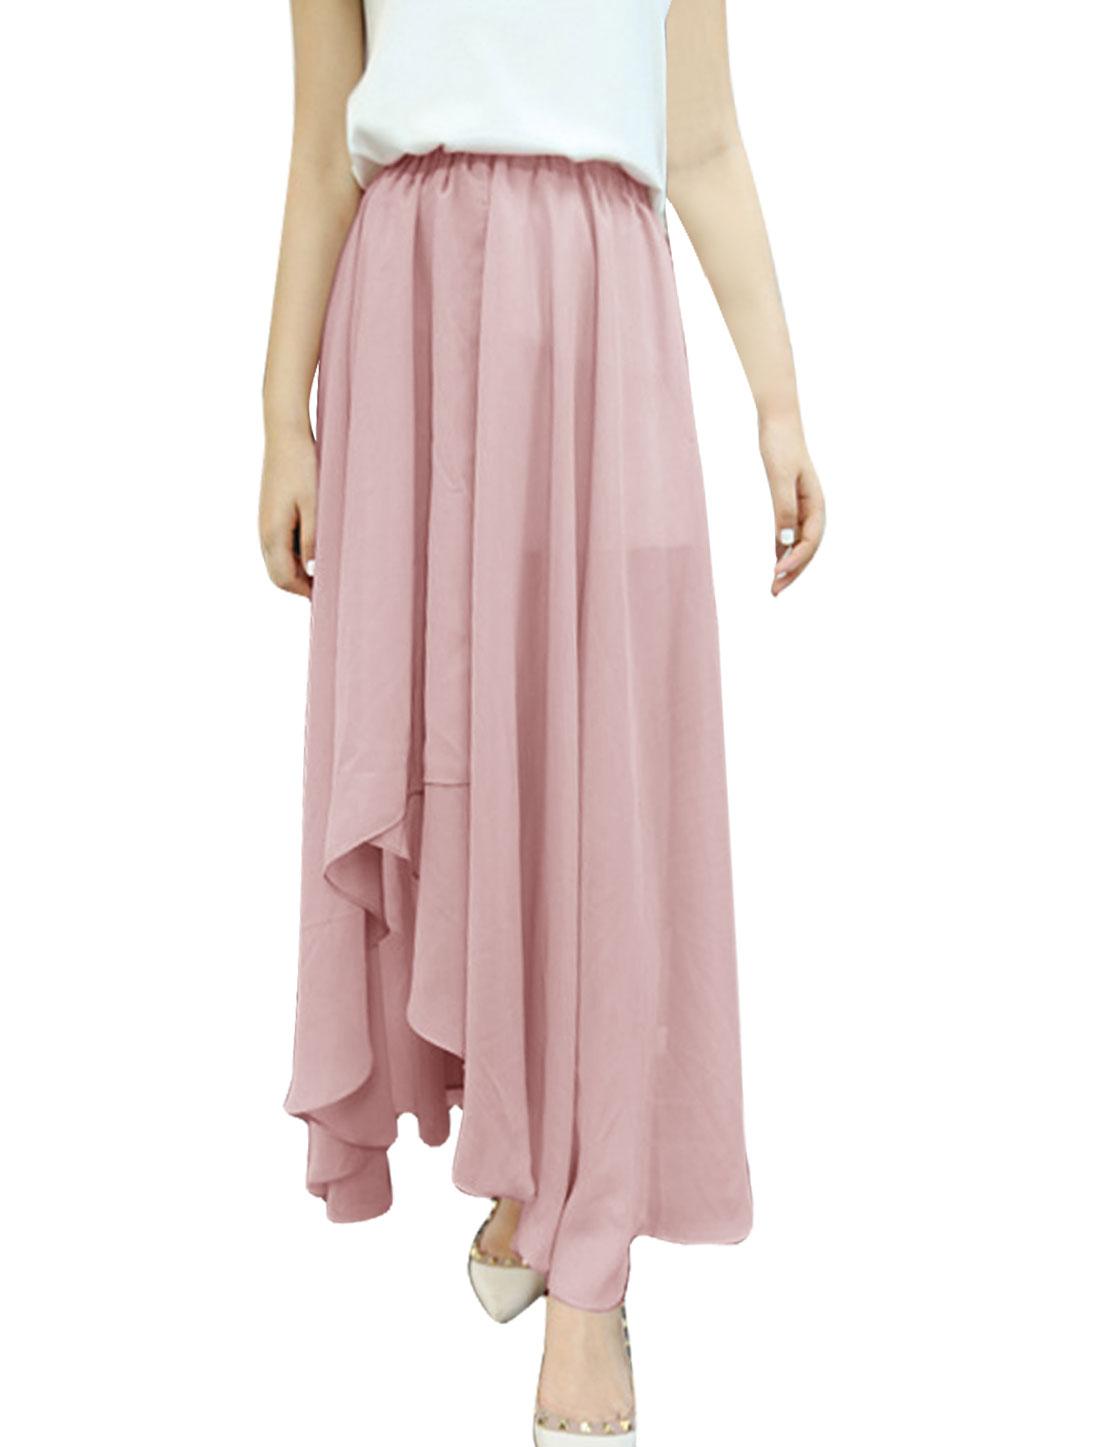 Ladies Chic Asymmetric Hem Design Pure Pink Lined Long Skirt